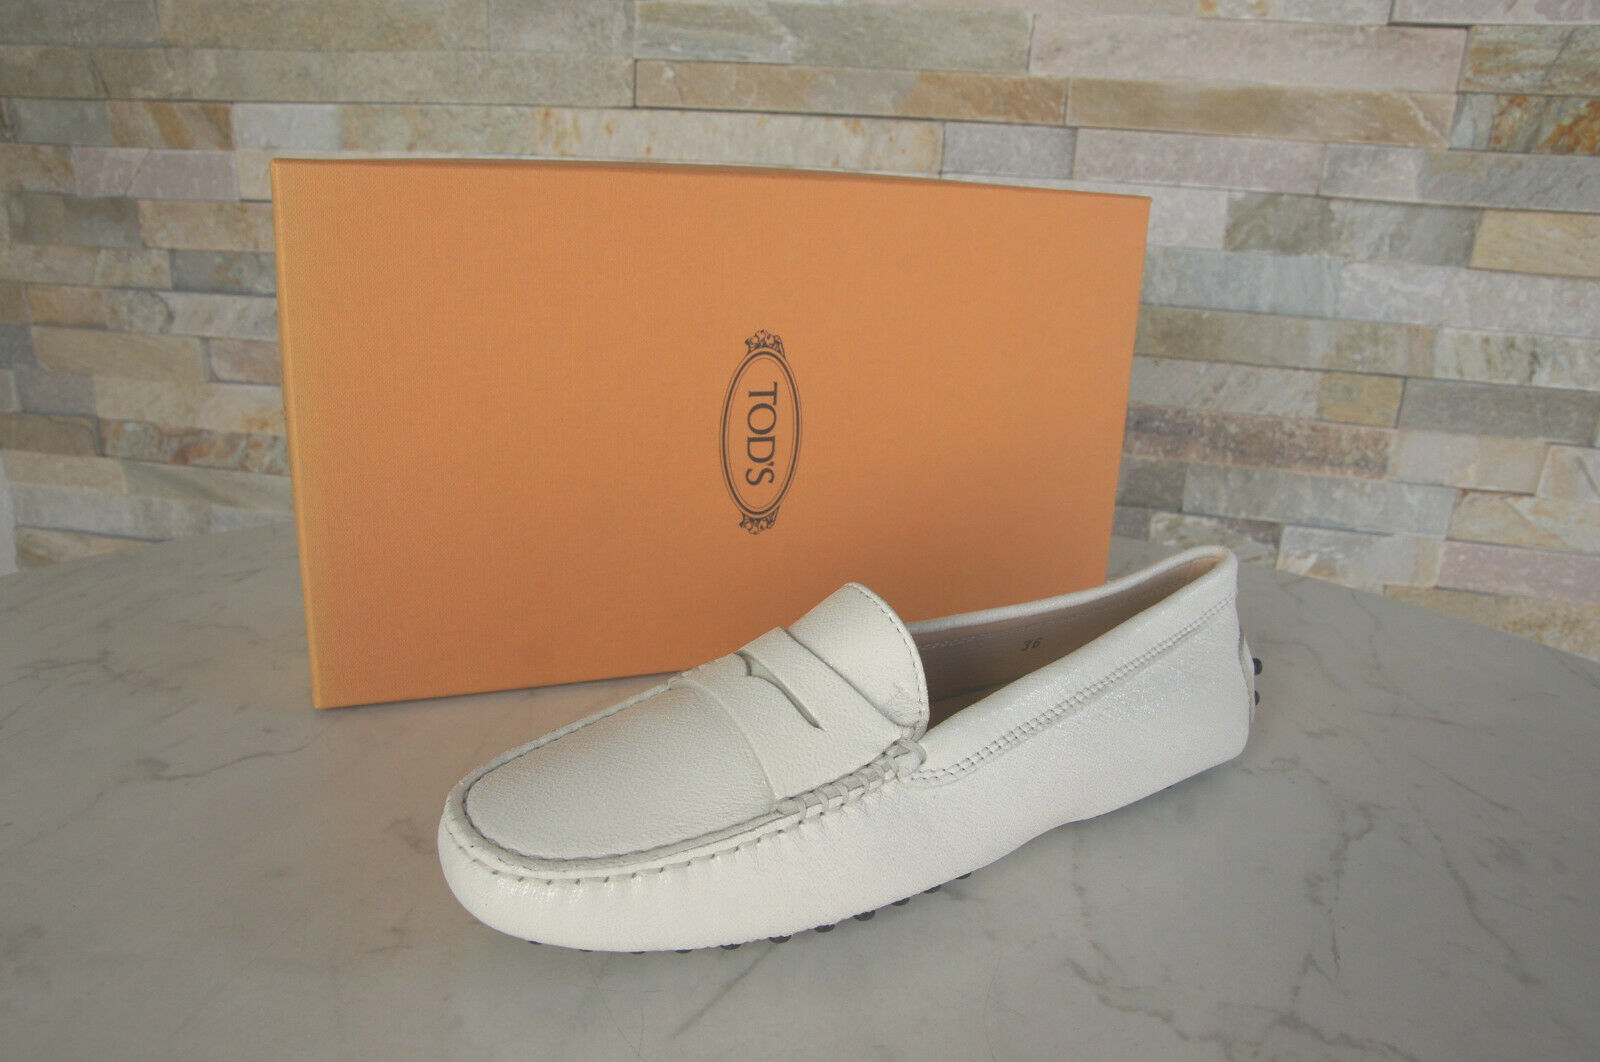 Tod Tod S 36  Slippers Moccasins Lofers Low scarpe bianca scarpe New Ehemuvp  promozioni di squadra